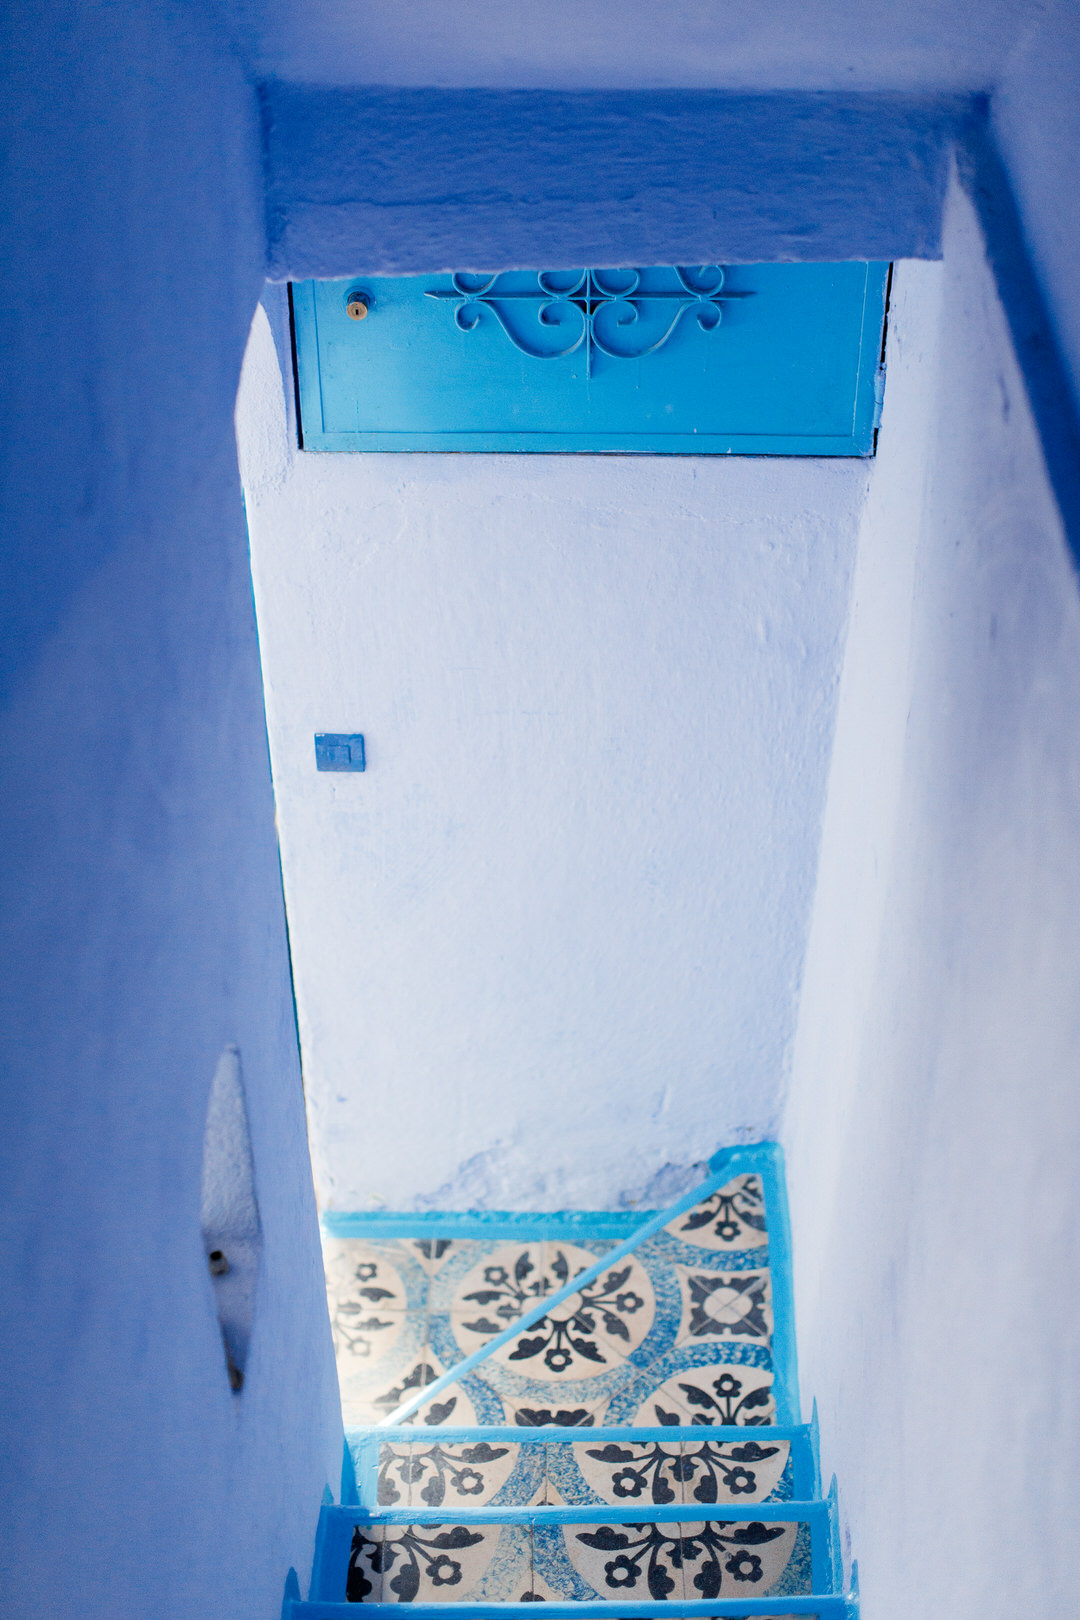 Melissa Kruse Photography - Chefchaouen Morocco (web)-15.jpg